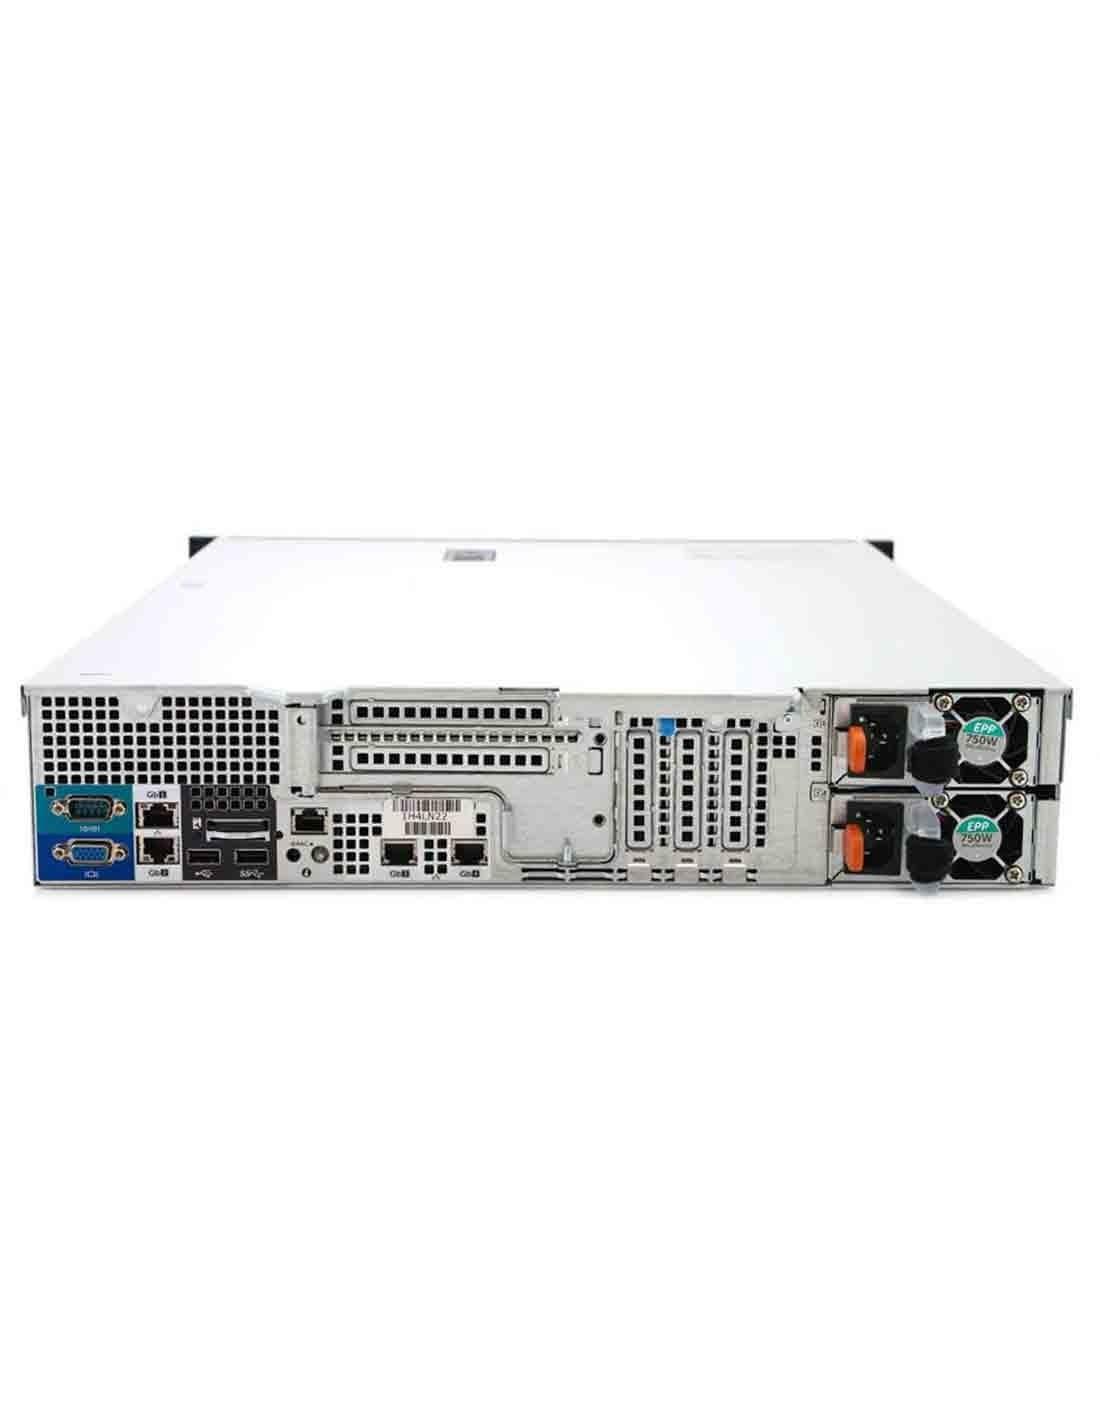 Dell PowerEdge R530 Rack Server at a Cheap Price in Dubai UAE